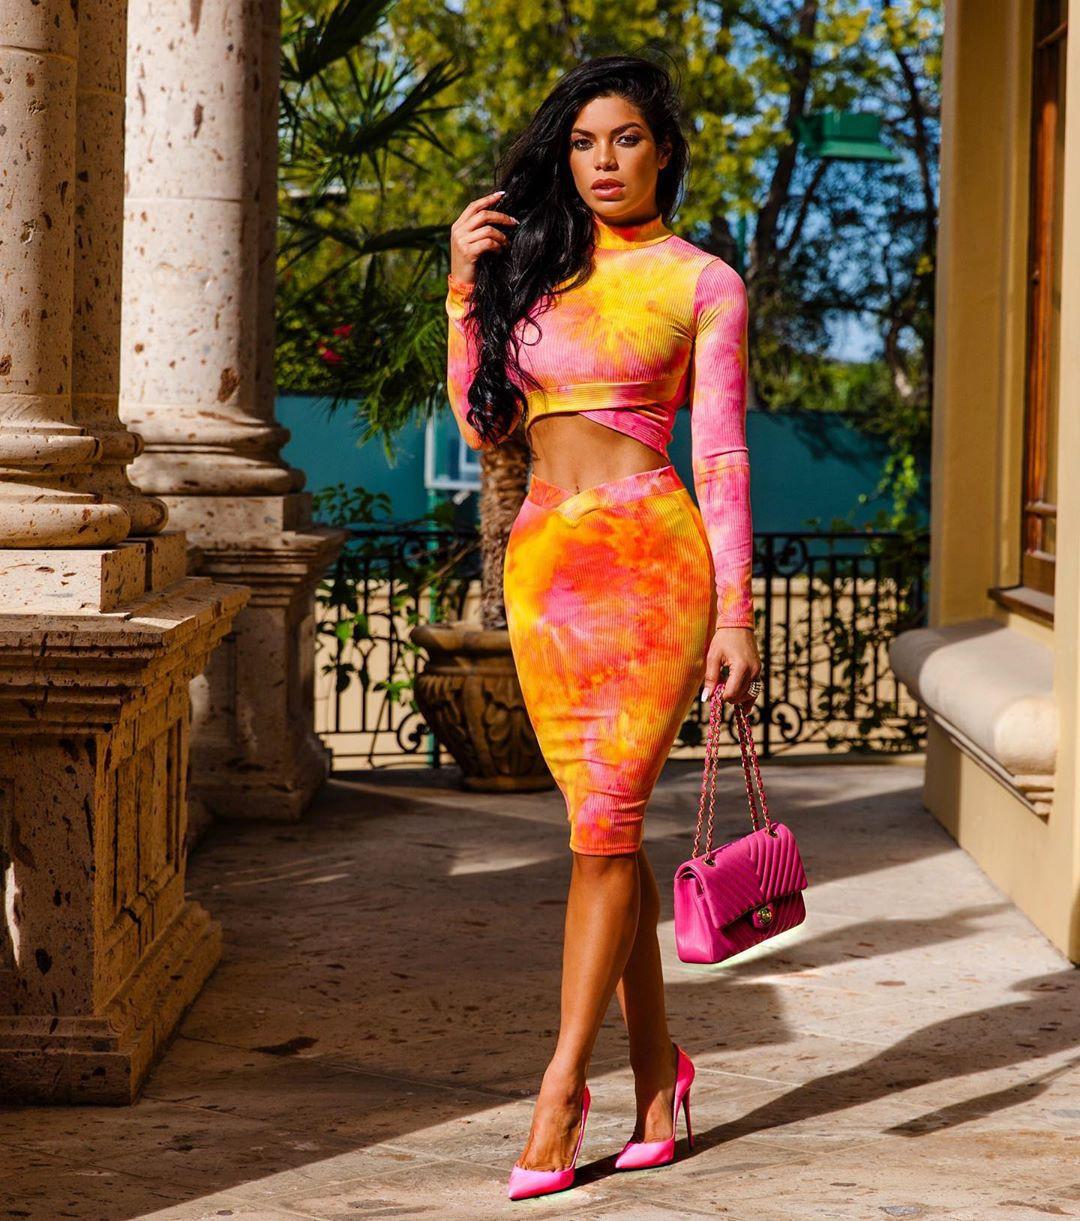 Magenta and yellow dress, costumes designs, fashion model